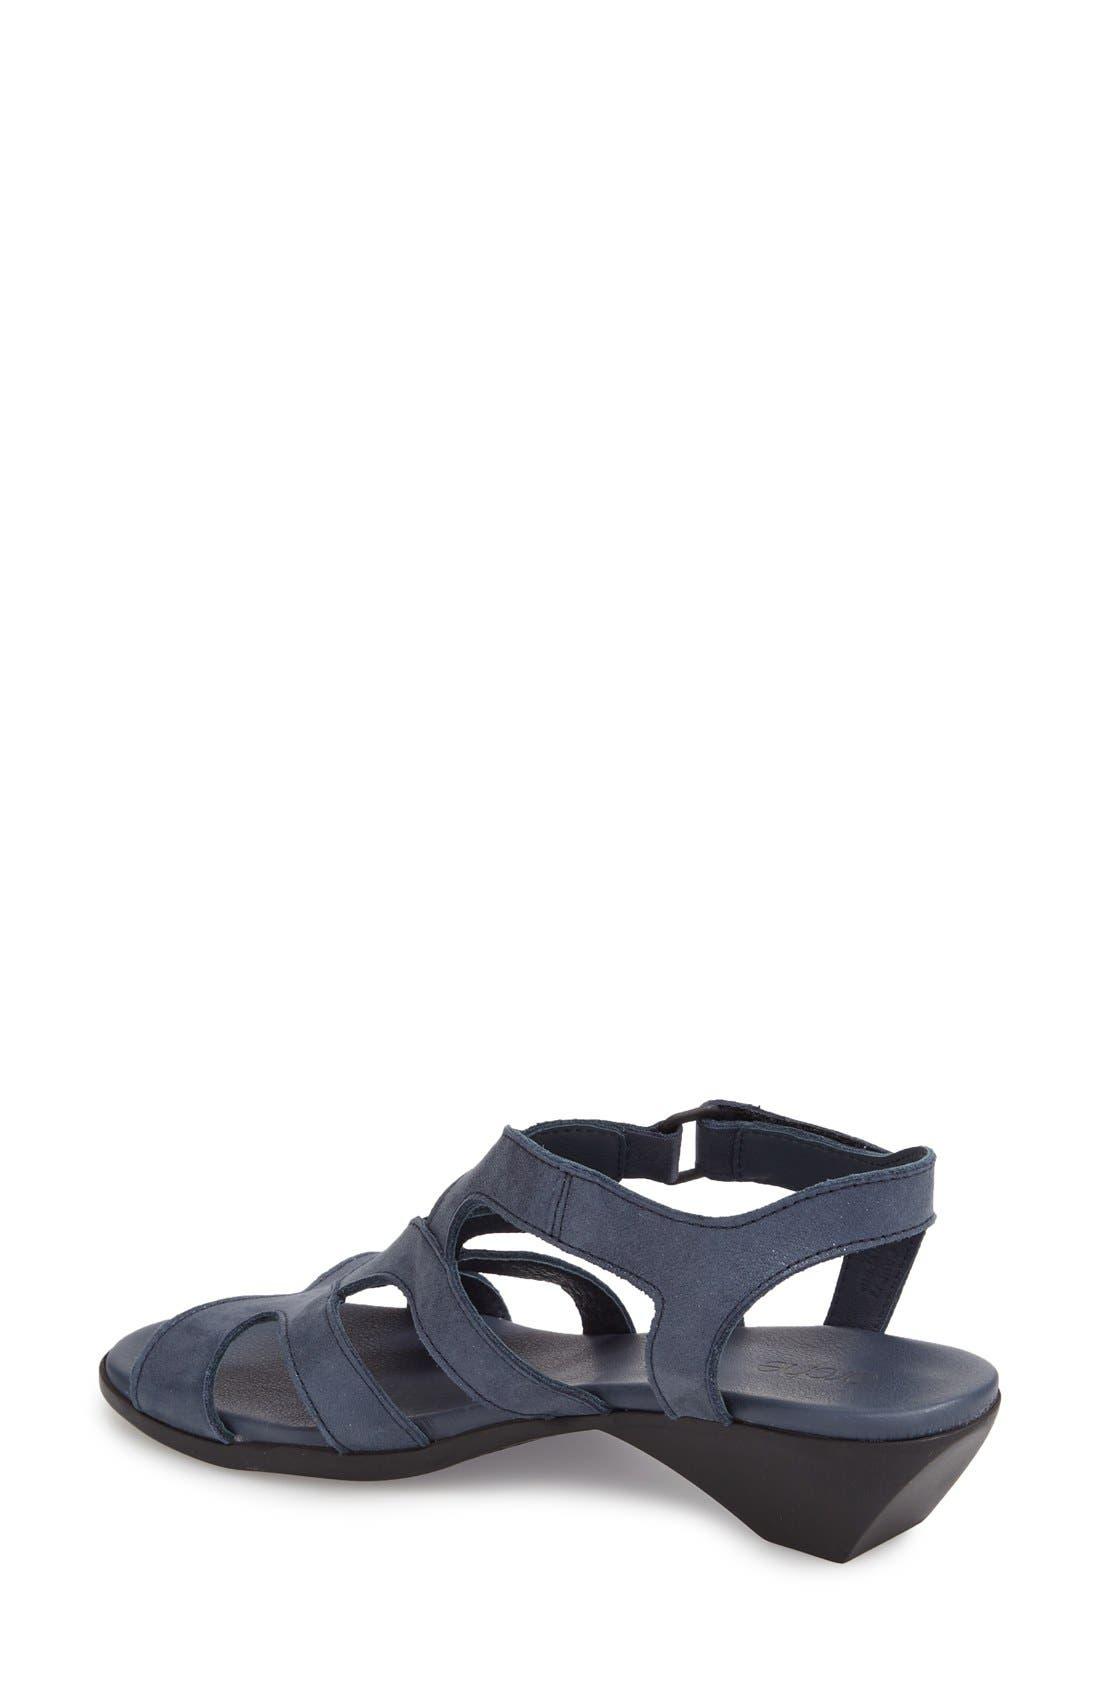 'Obela' Water Resistant Leather Sandal,                             Alternate thumbnail 11, color,